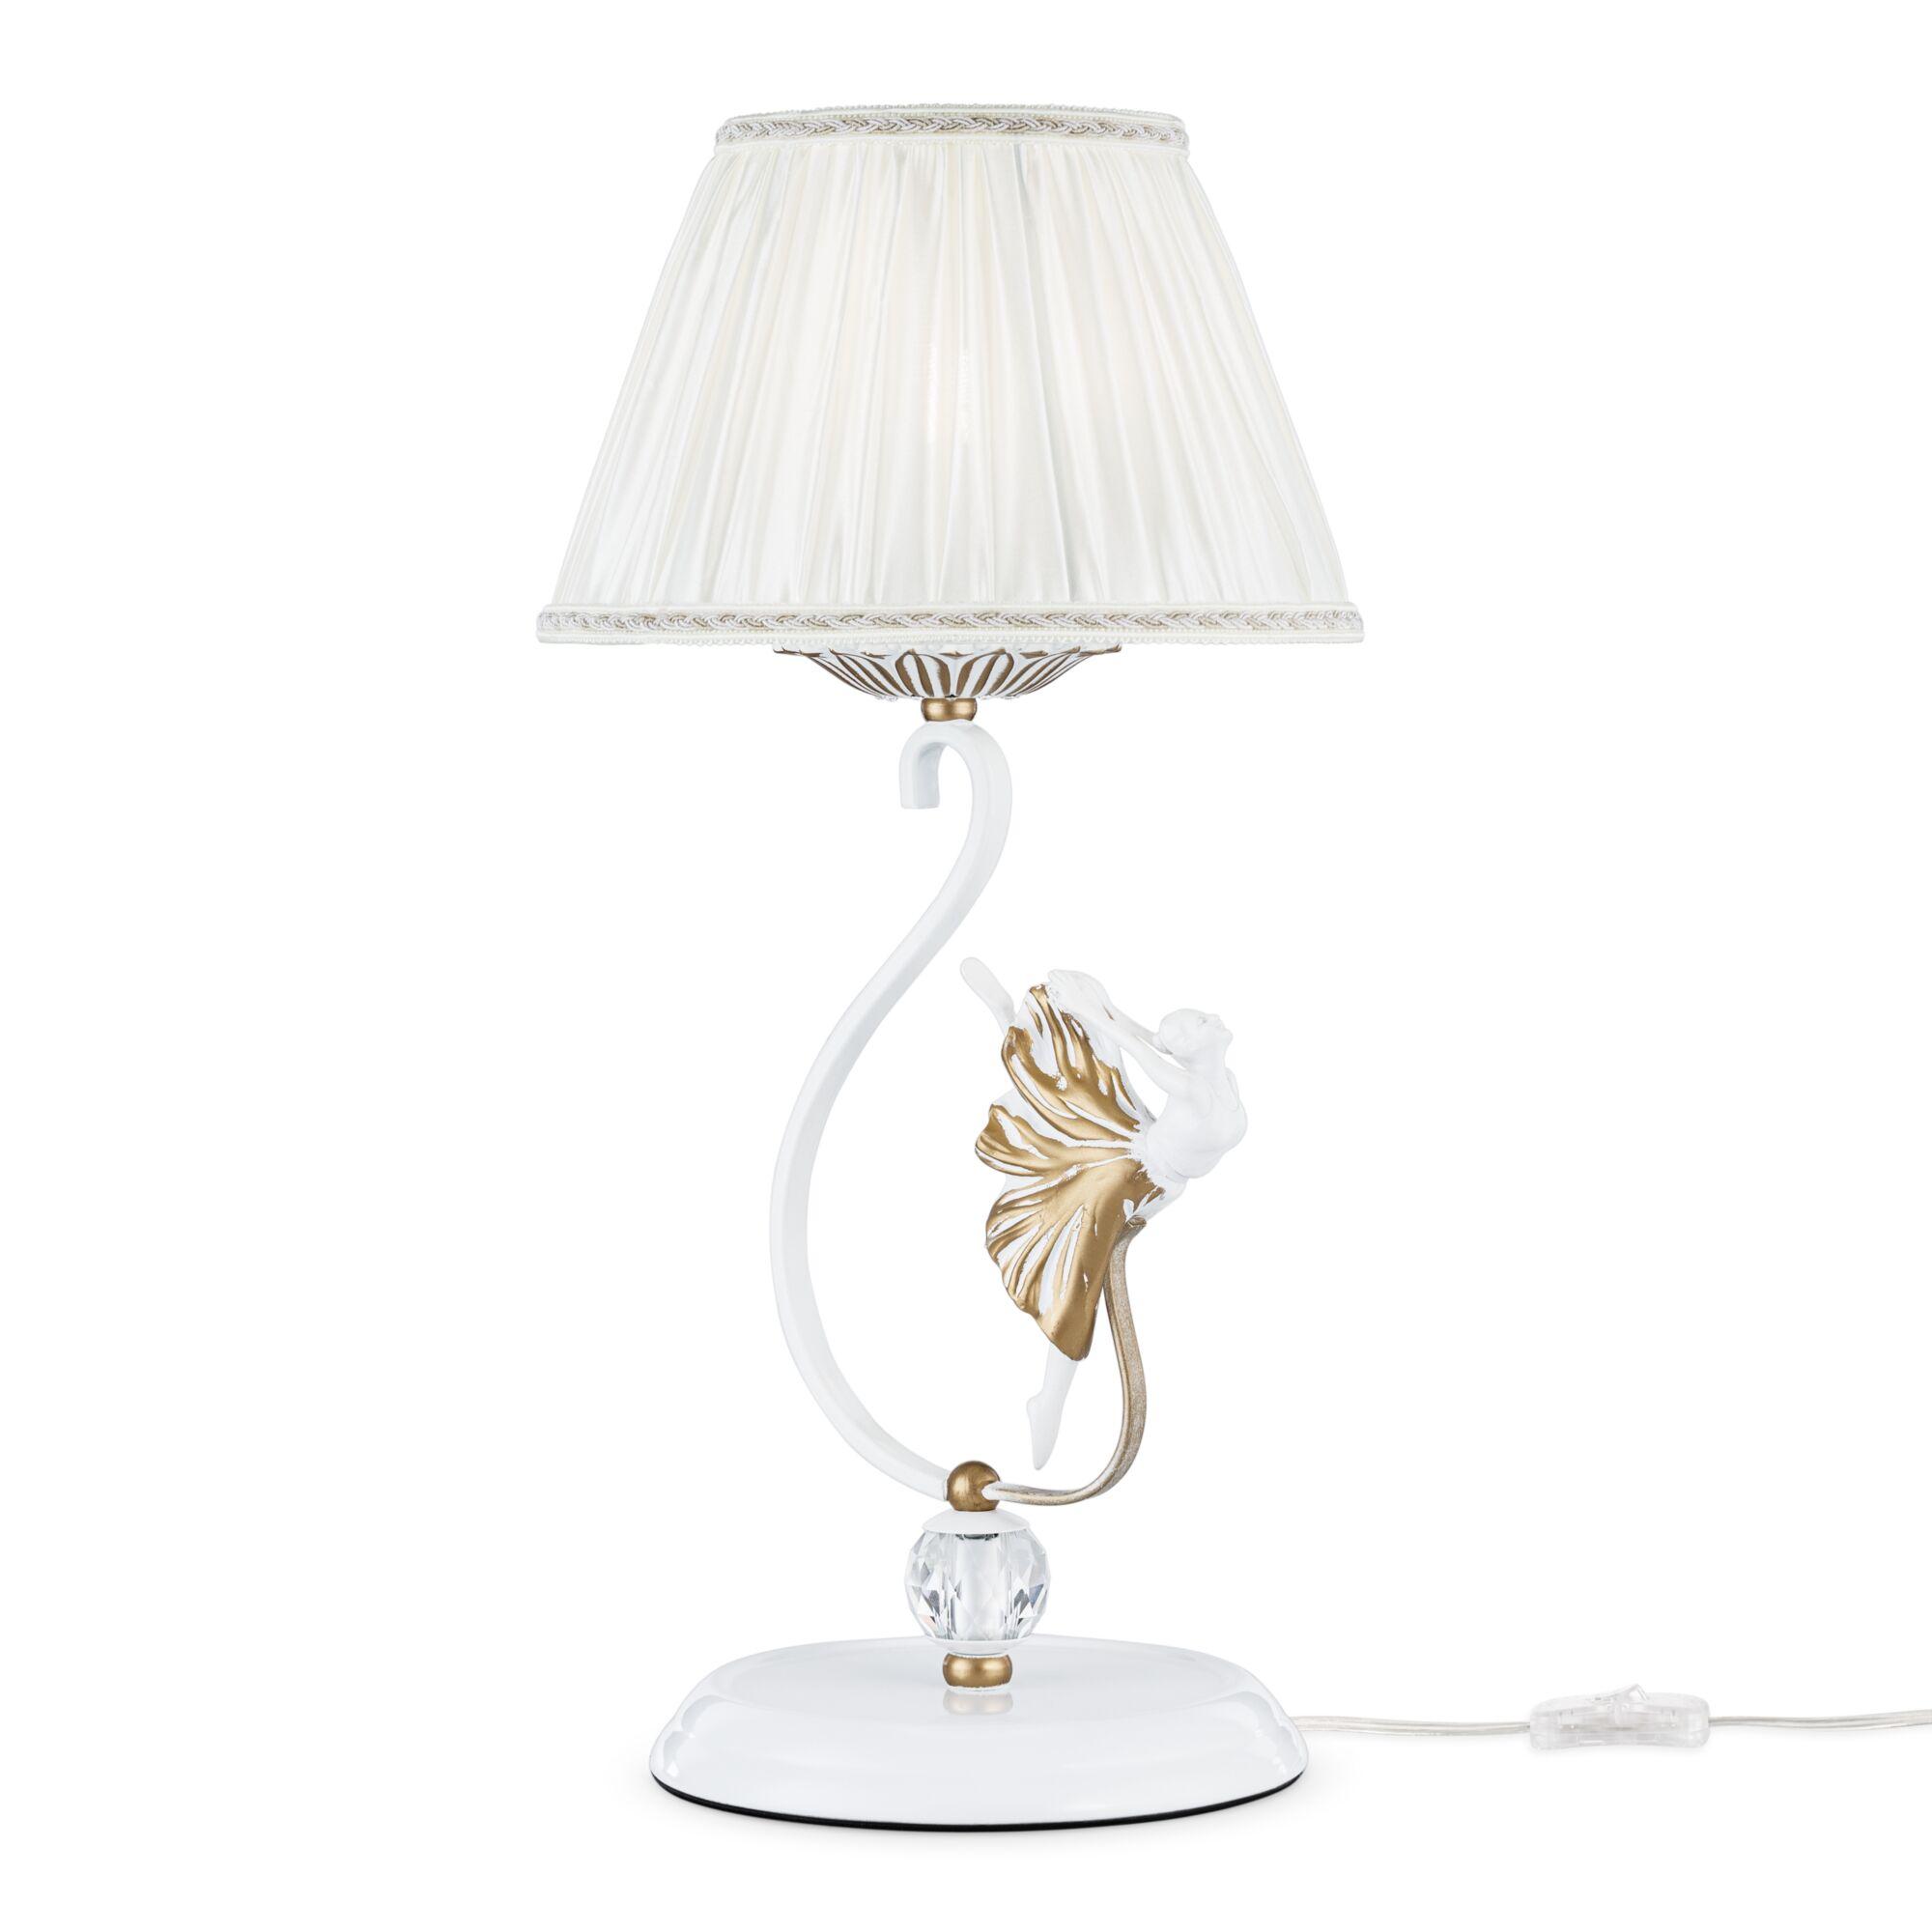 Настольная лампа Maytoni ARM222-11-G Белый с Золотом 1хE14х40W настольная лампа eurosvet 01002 1 белый с золотом